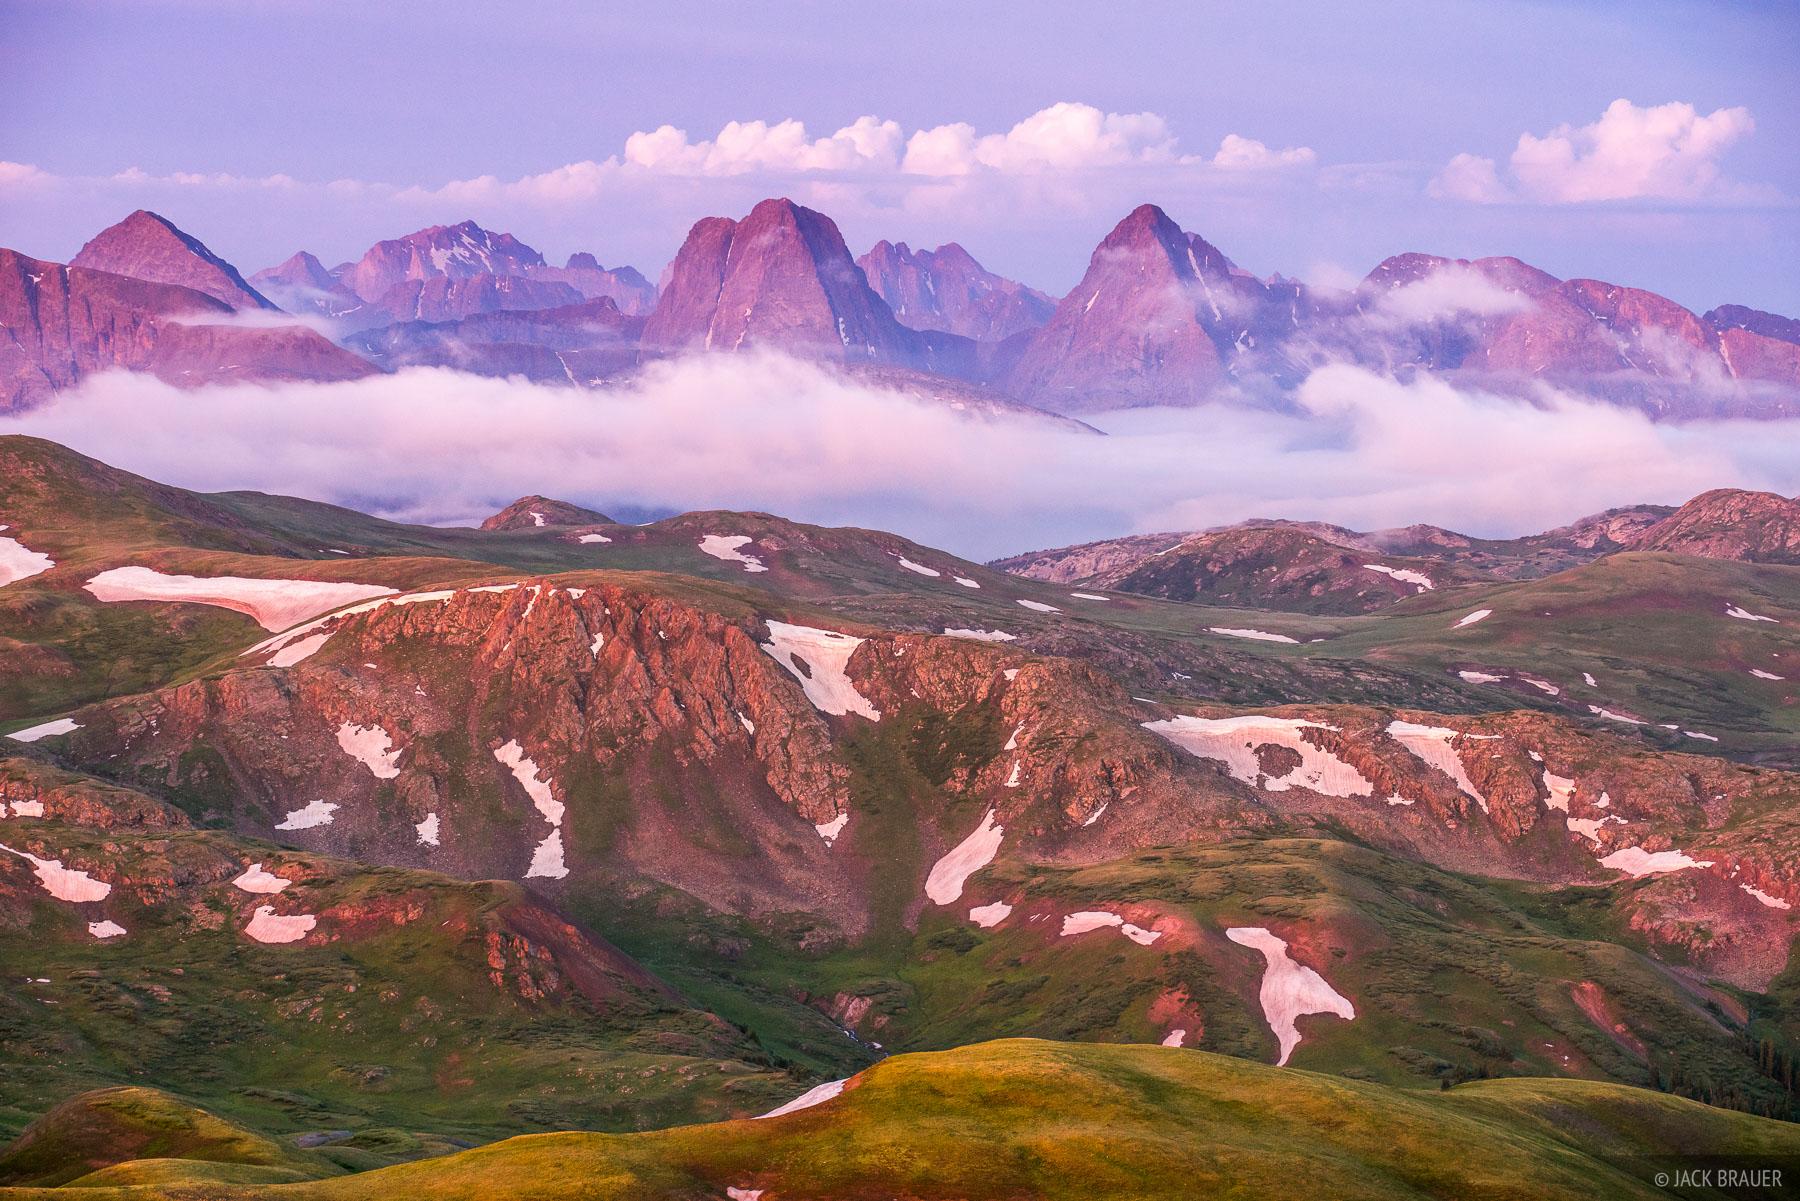 Colorado,Grenadier Range,San Juan Mountains,Stony Pass,Weminuche Wilderness, Vestal Peak, Arrow Peak, photo